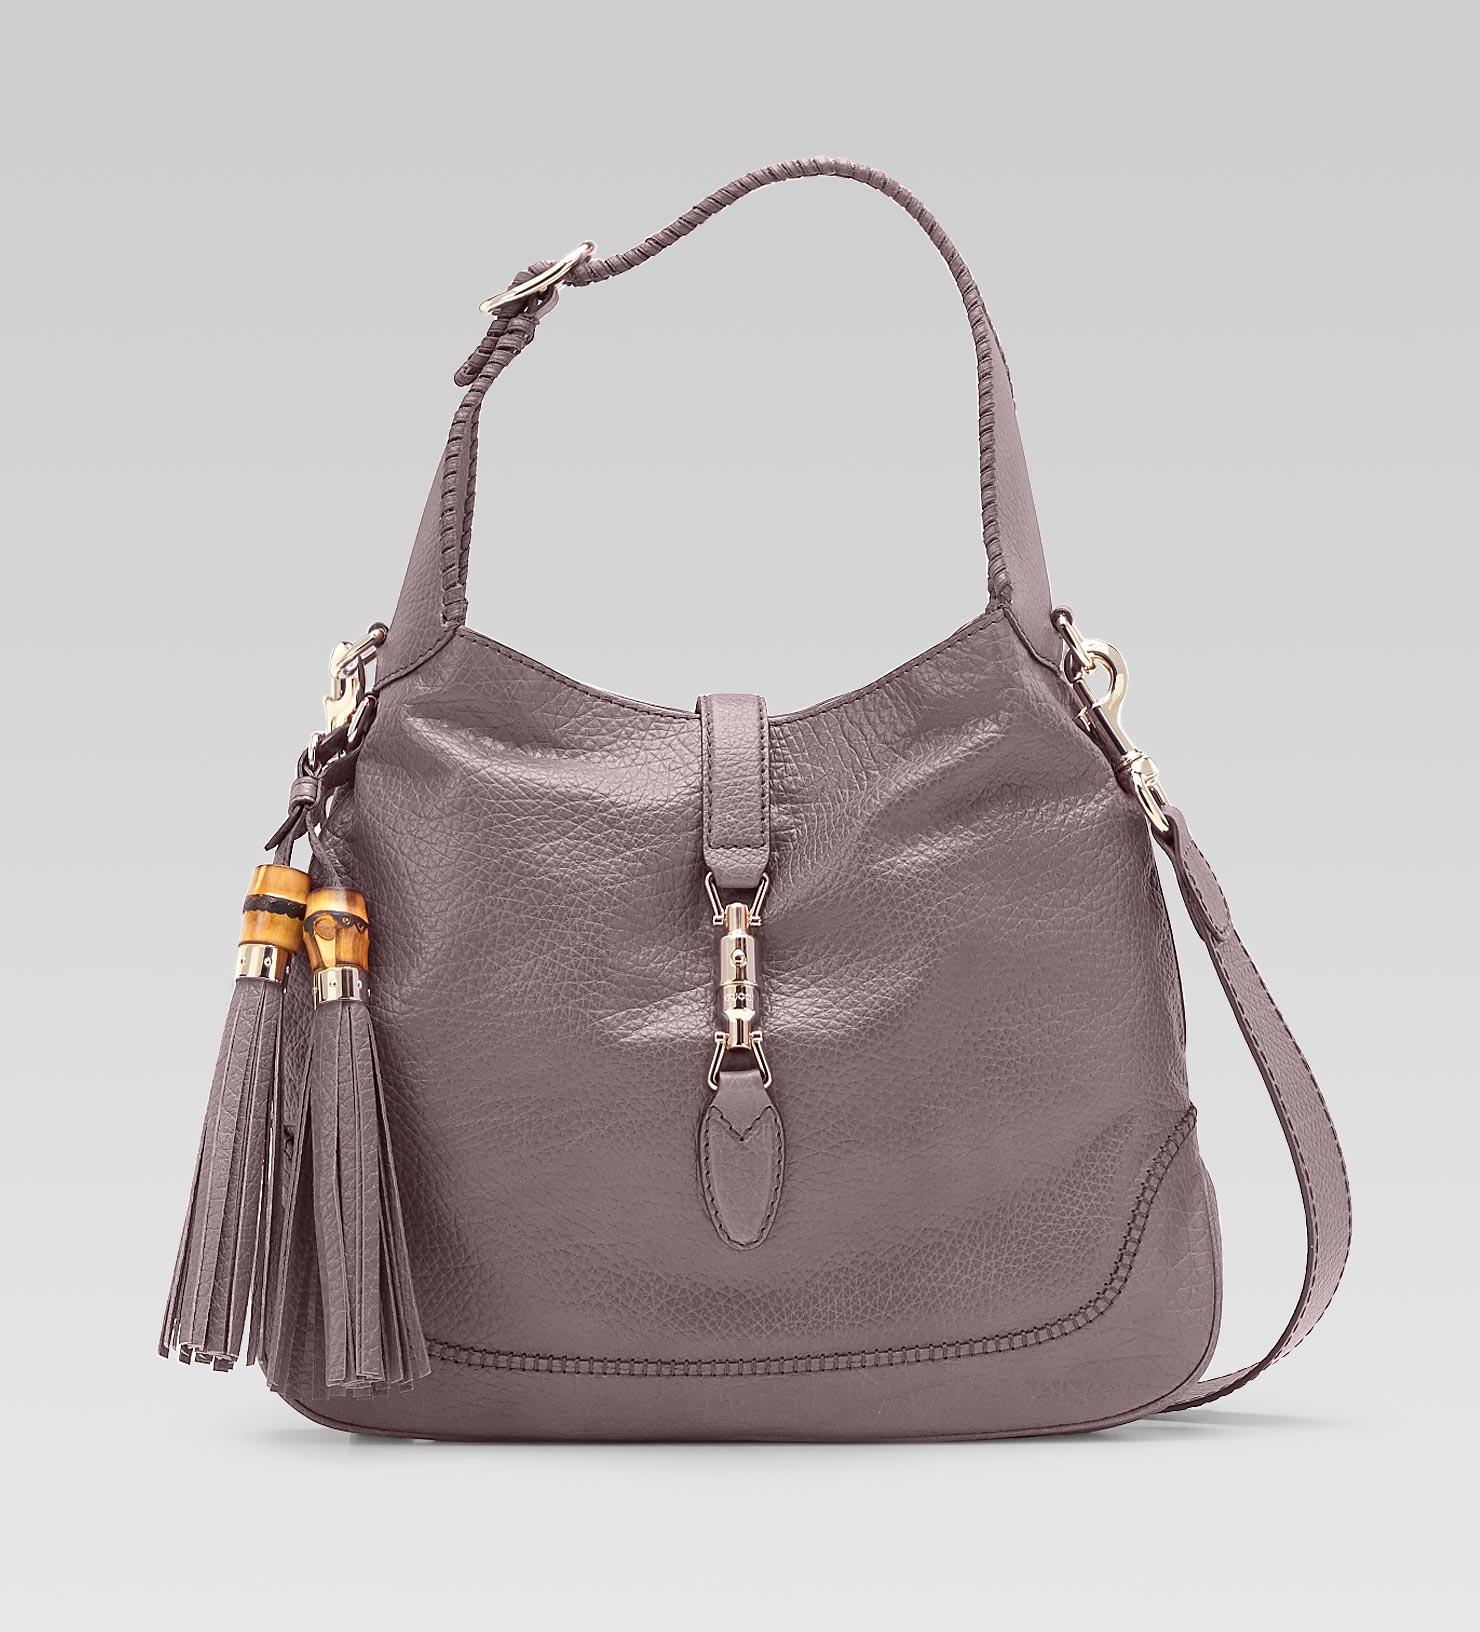 cf3edff9f08 Gucci new jackie shoulder bag